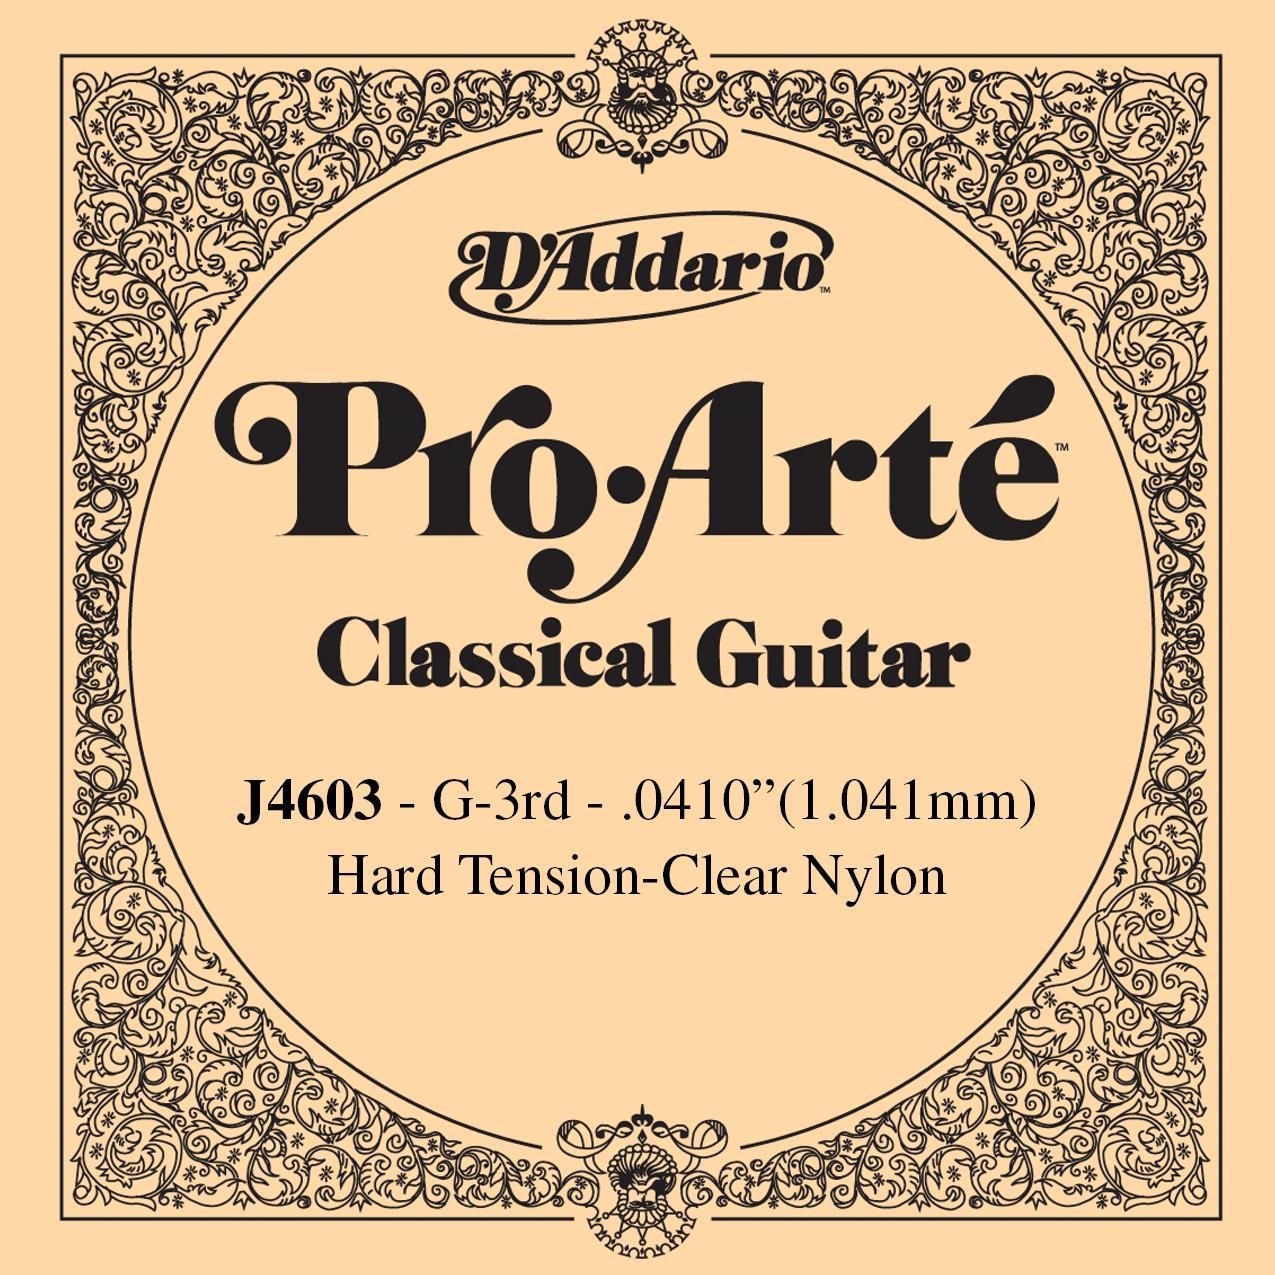 D'Addario J4603 Pro-Arte Nylon Classical Guitar Single String, Hard Tension, Thi...